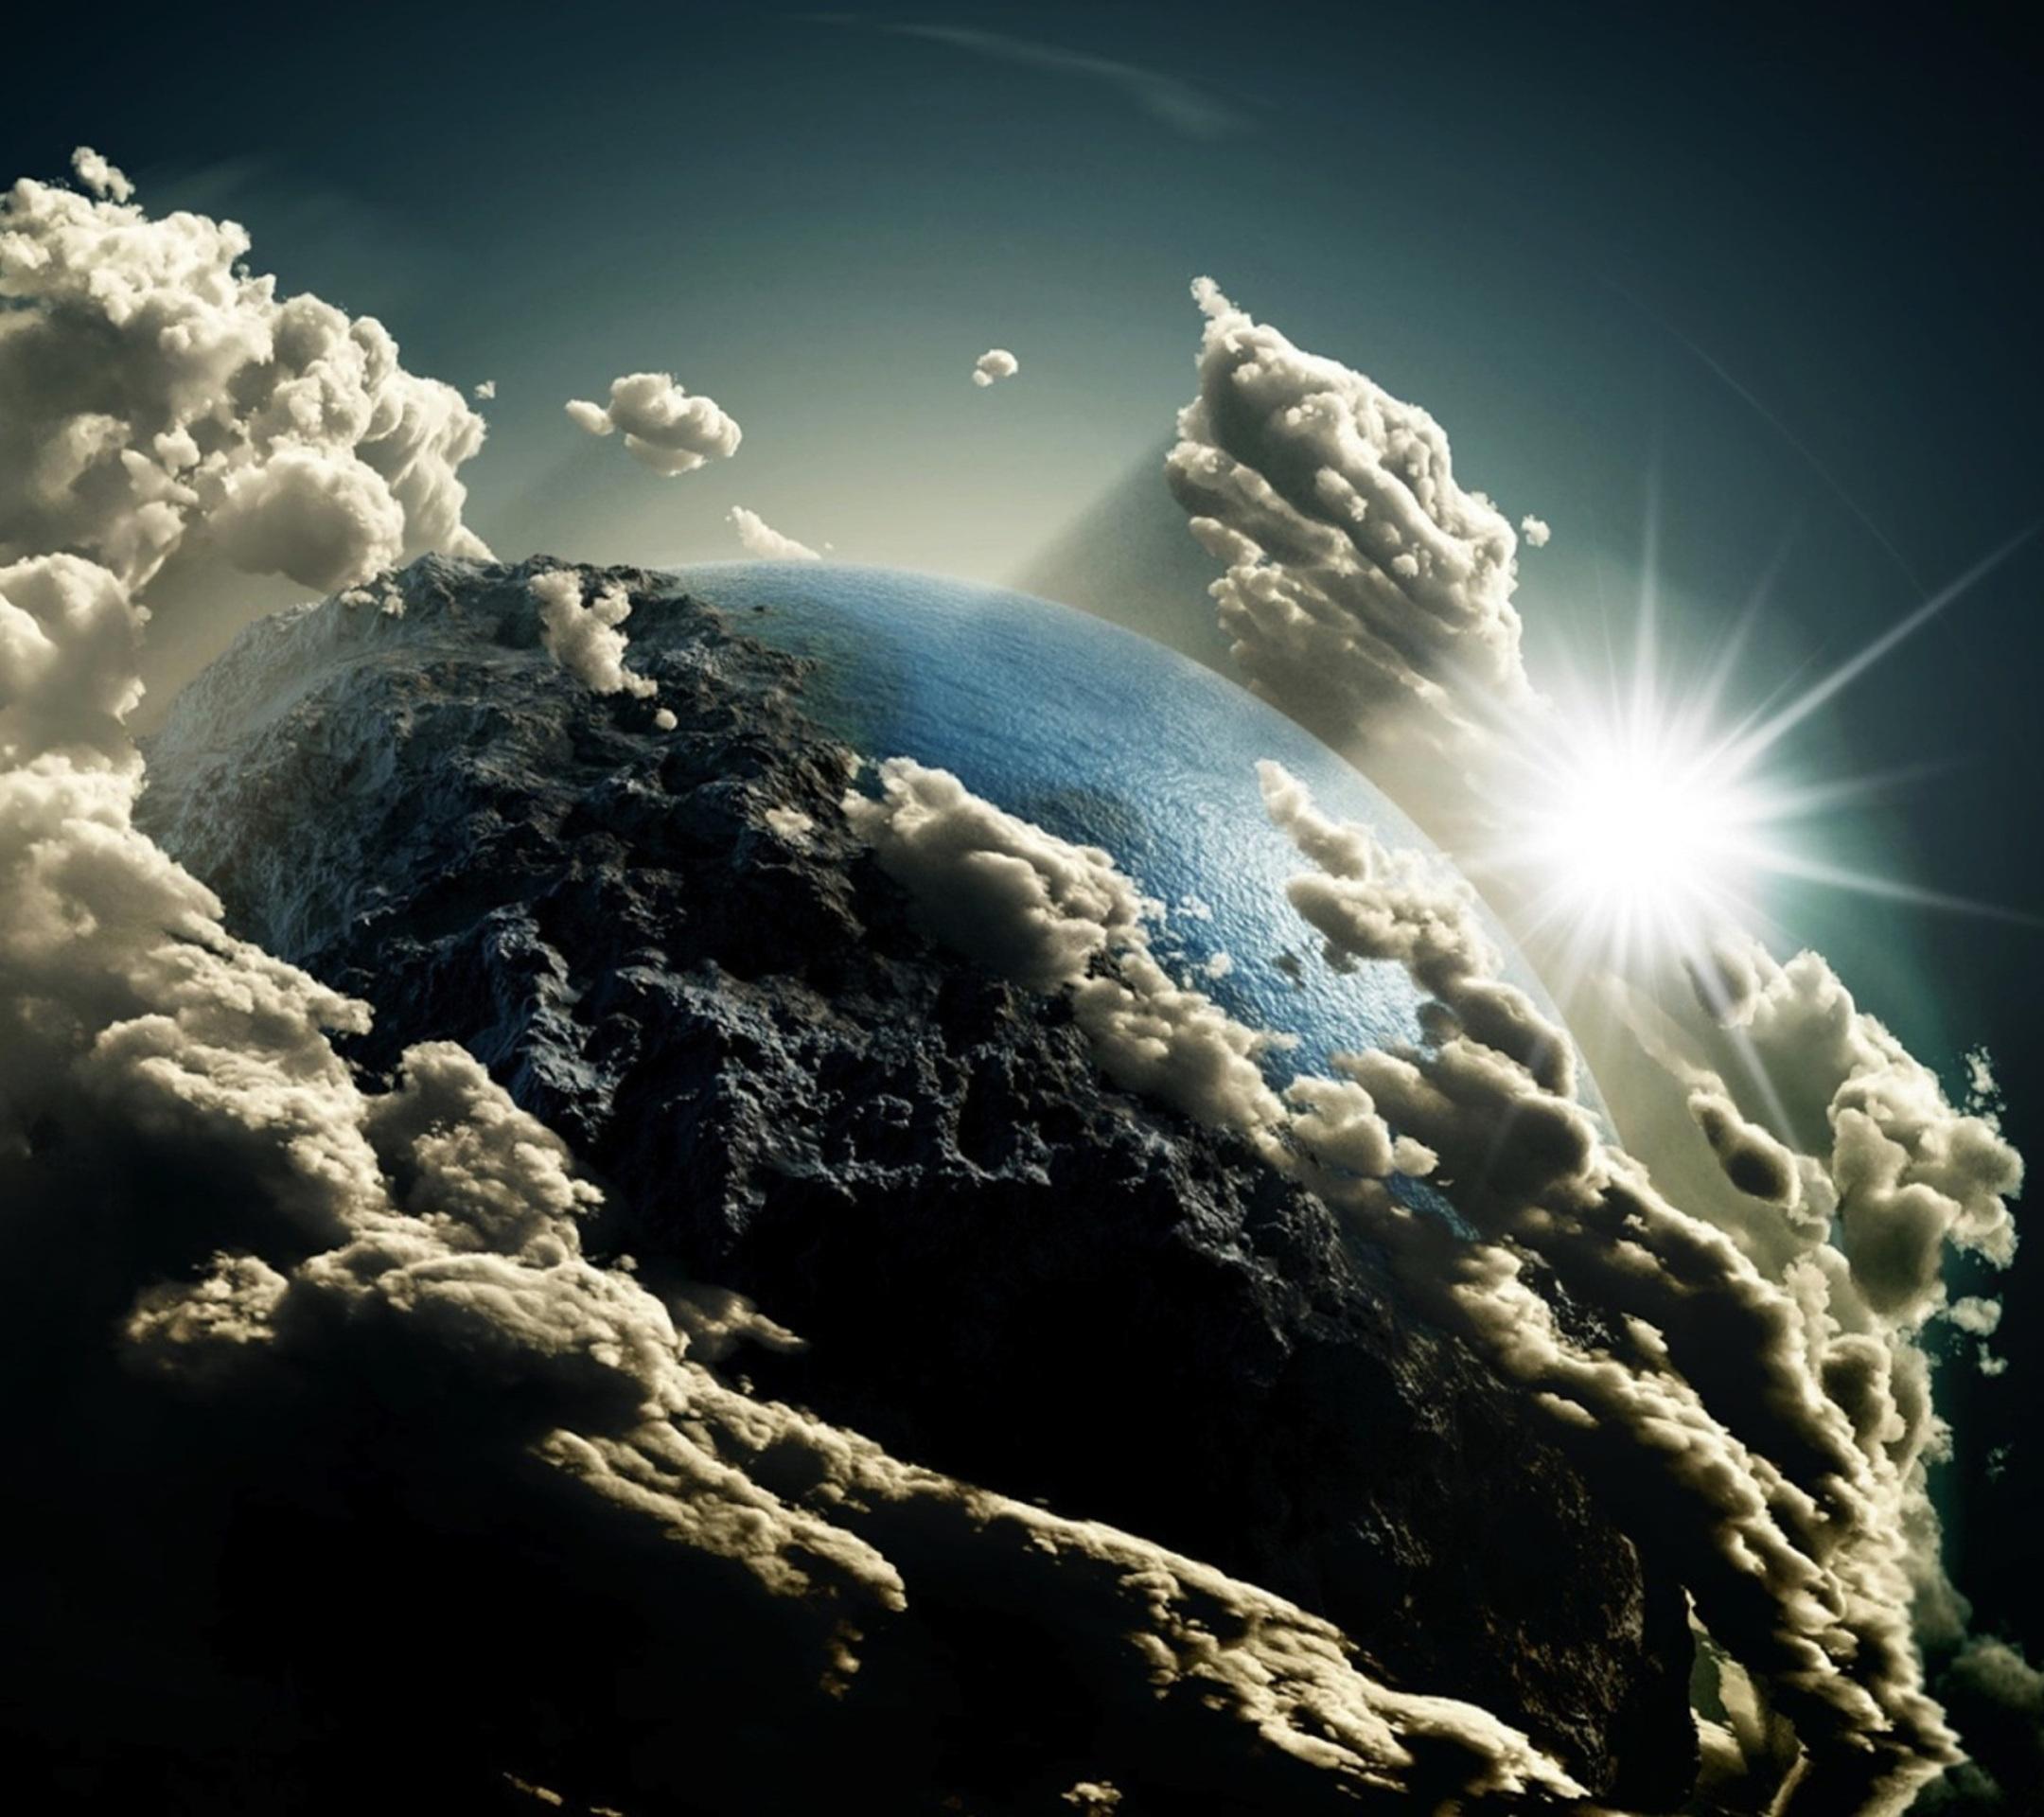 Cloud Wallpaper Hd: Best Galaxy Wallpapers